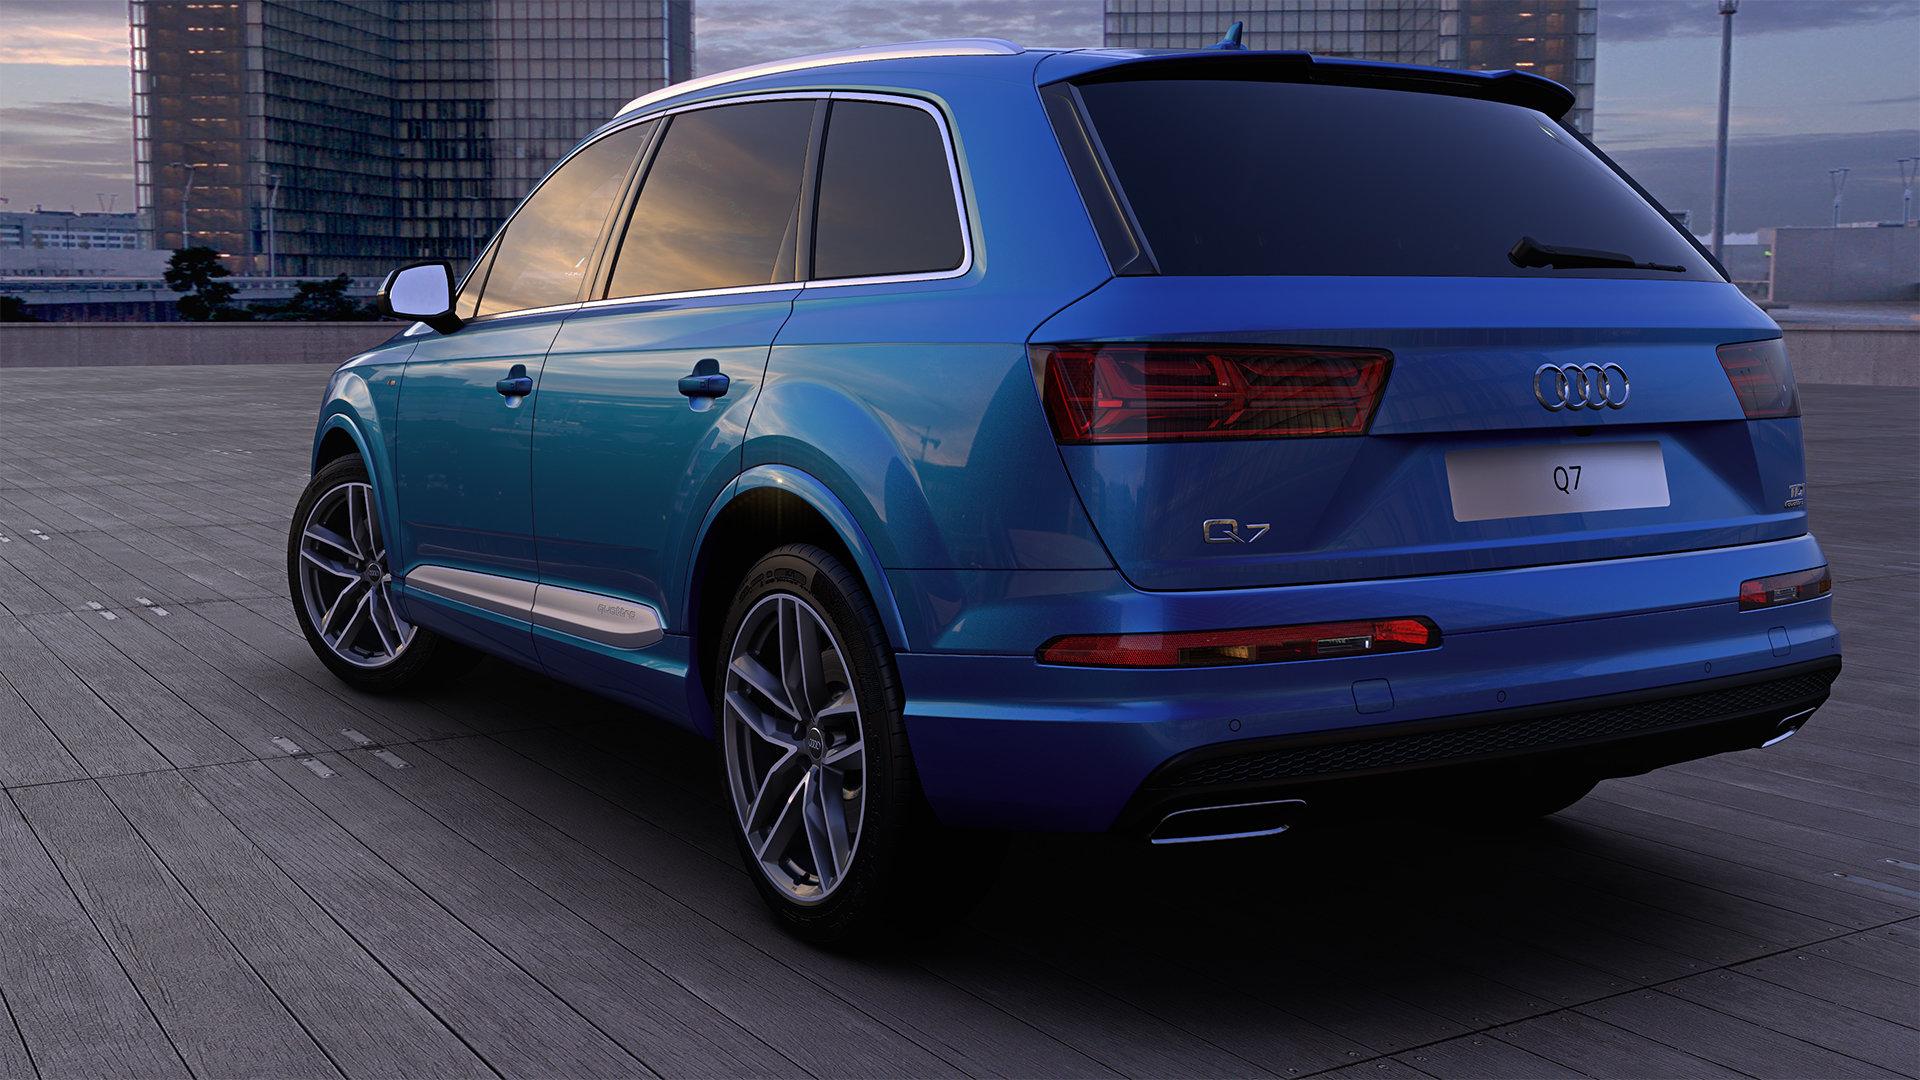 Audi Q7 im VR-Konfigurator